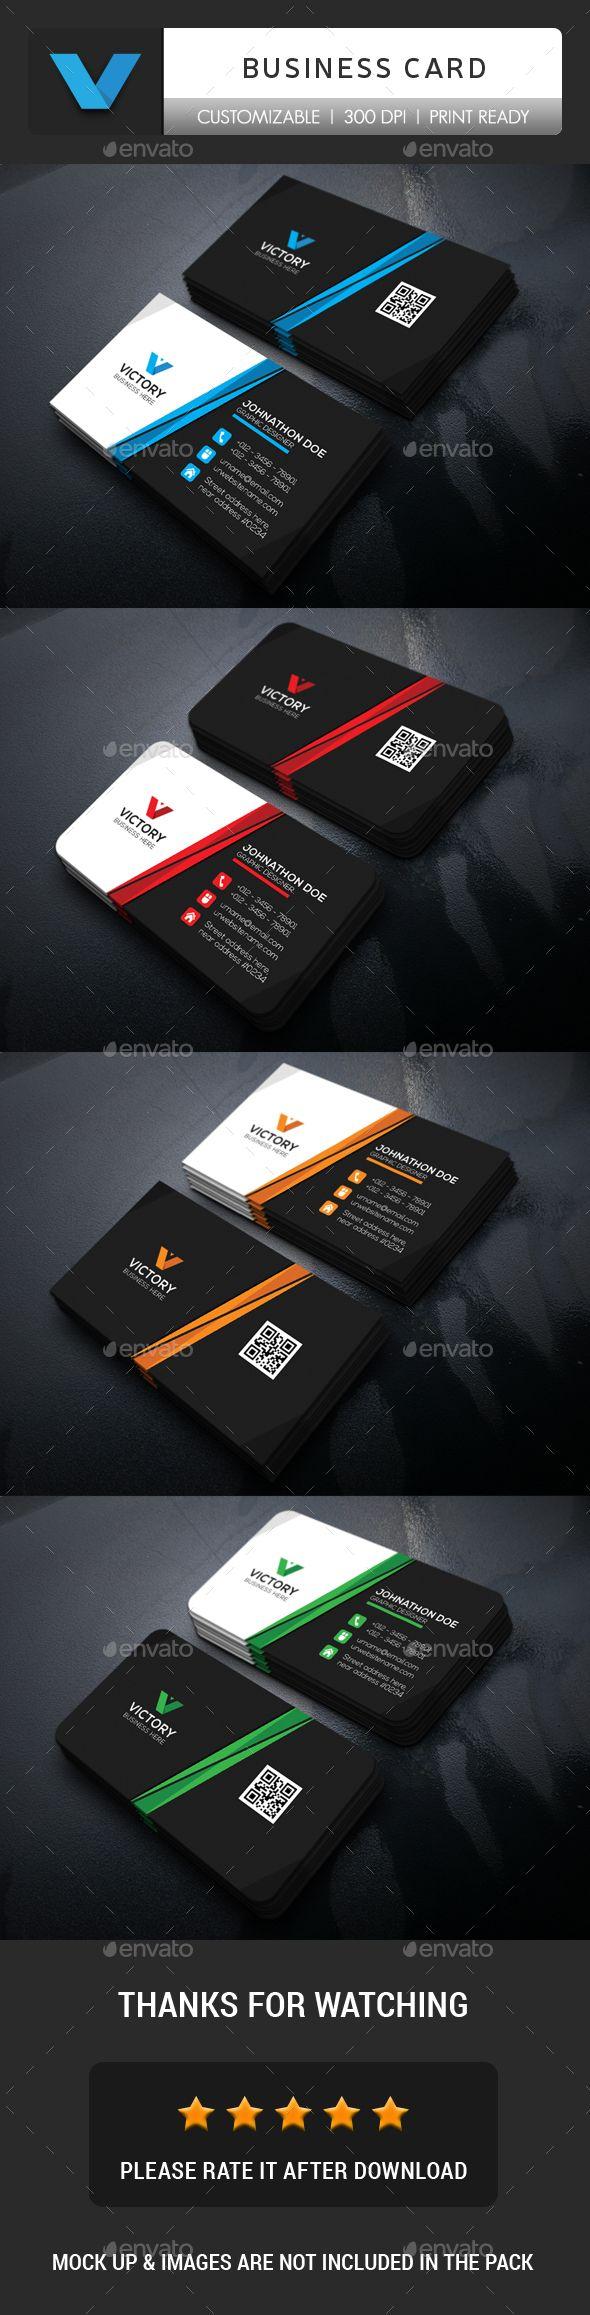 2334 Best Business Card Images On Pinterest Business Card Design